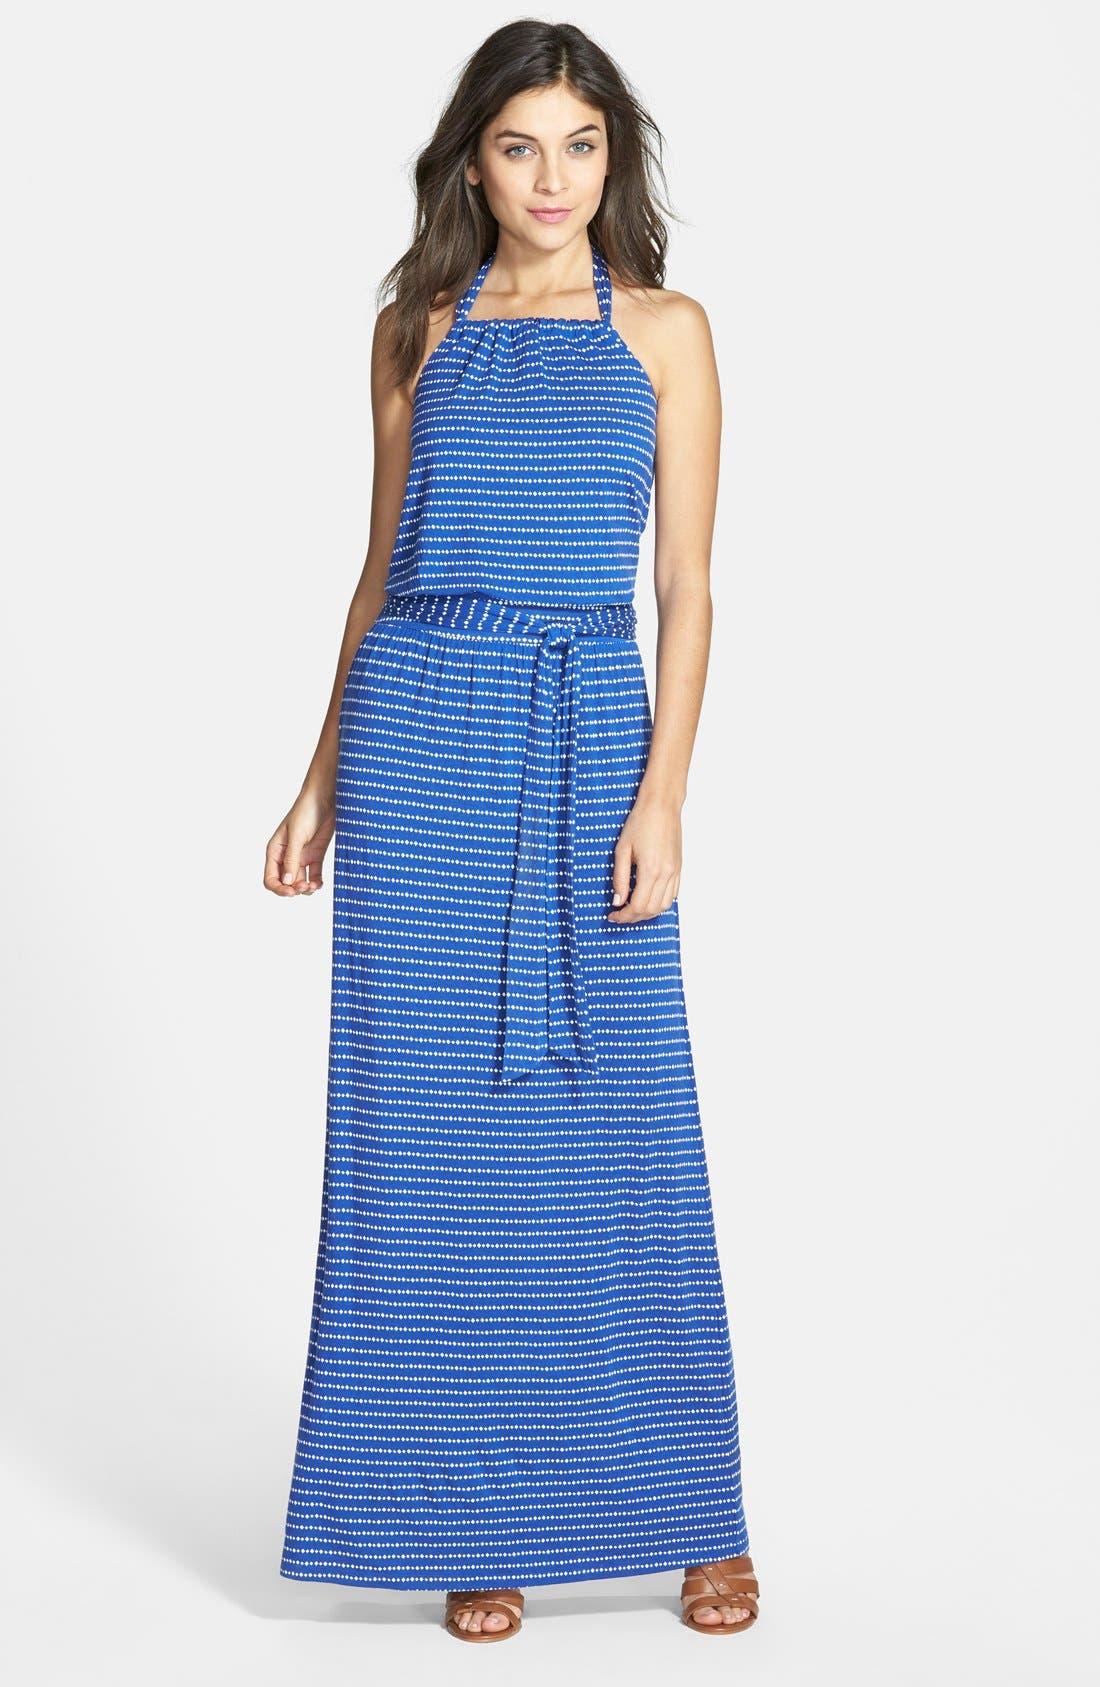 Alternate Image 1 Selected - Caslon® Stretch Knit Halter Maxi Dress